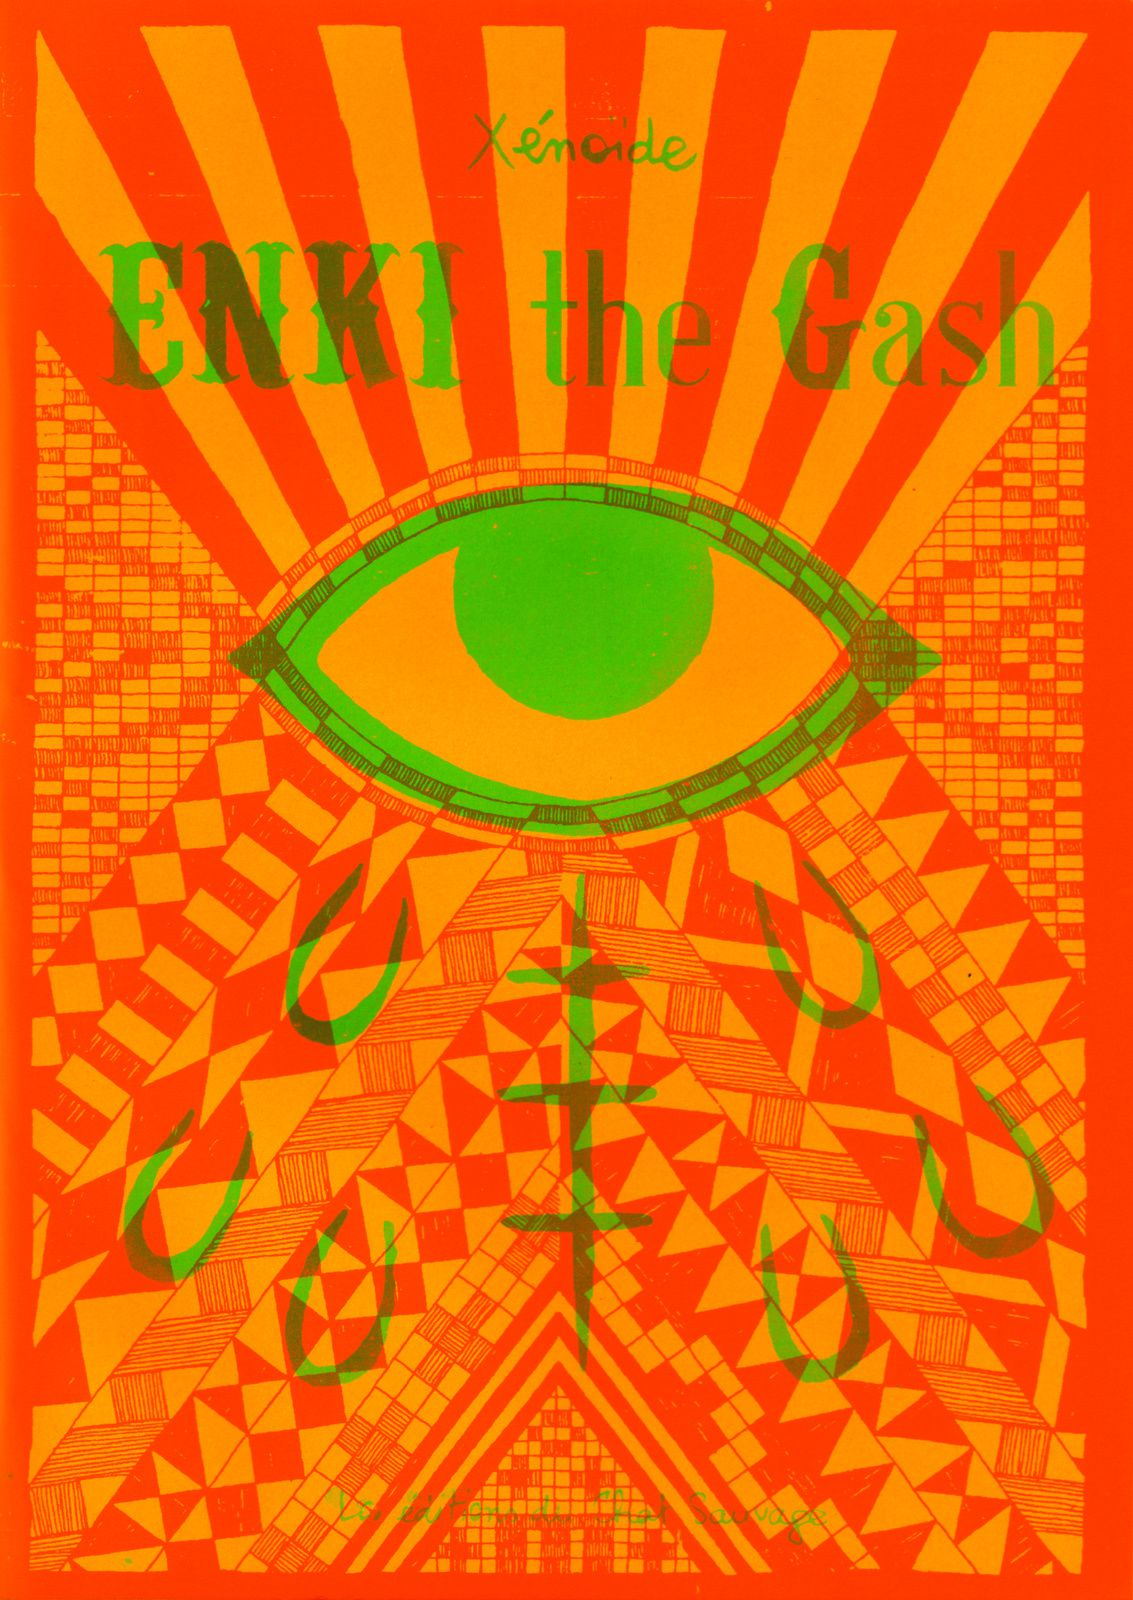 ENKI the Gash - Maintenant disponible